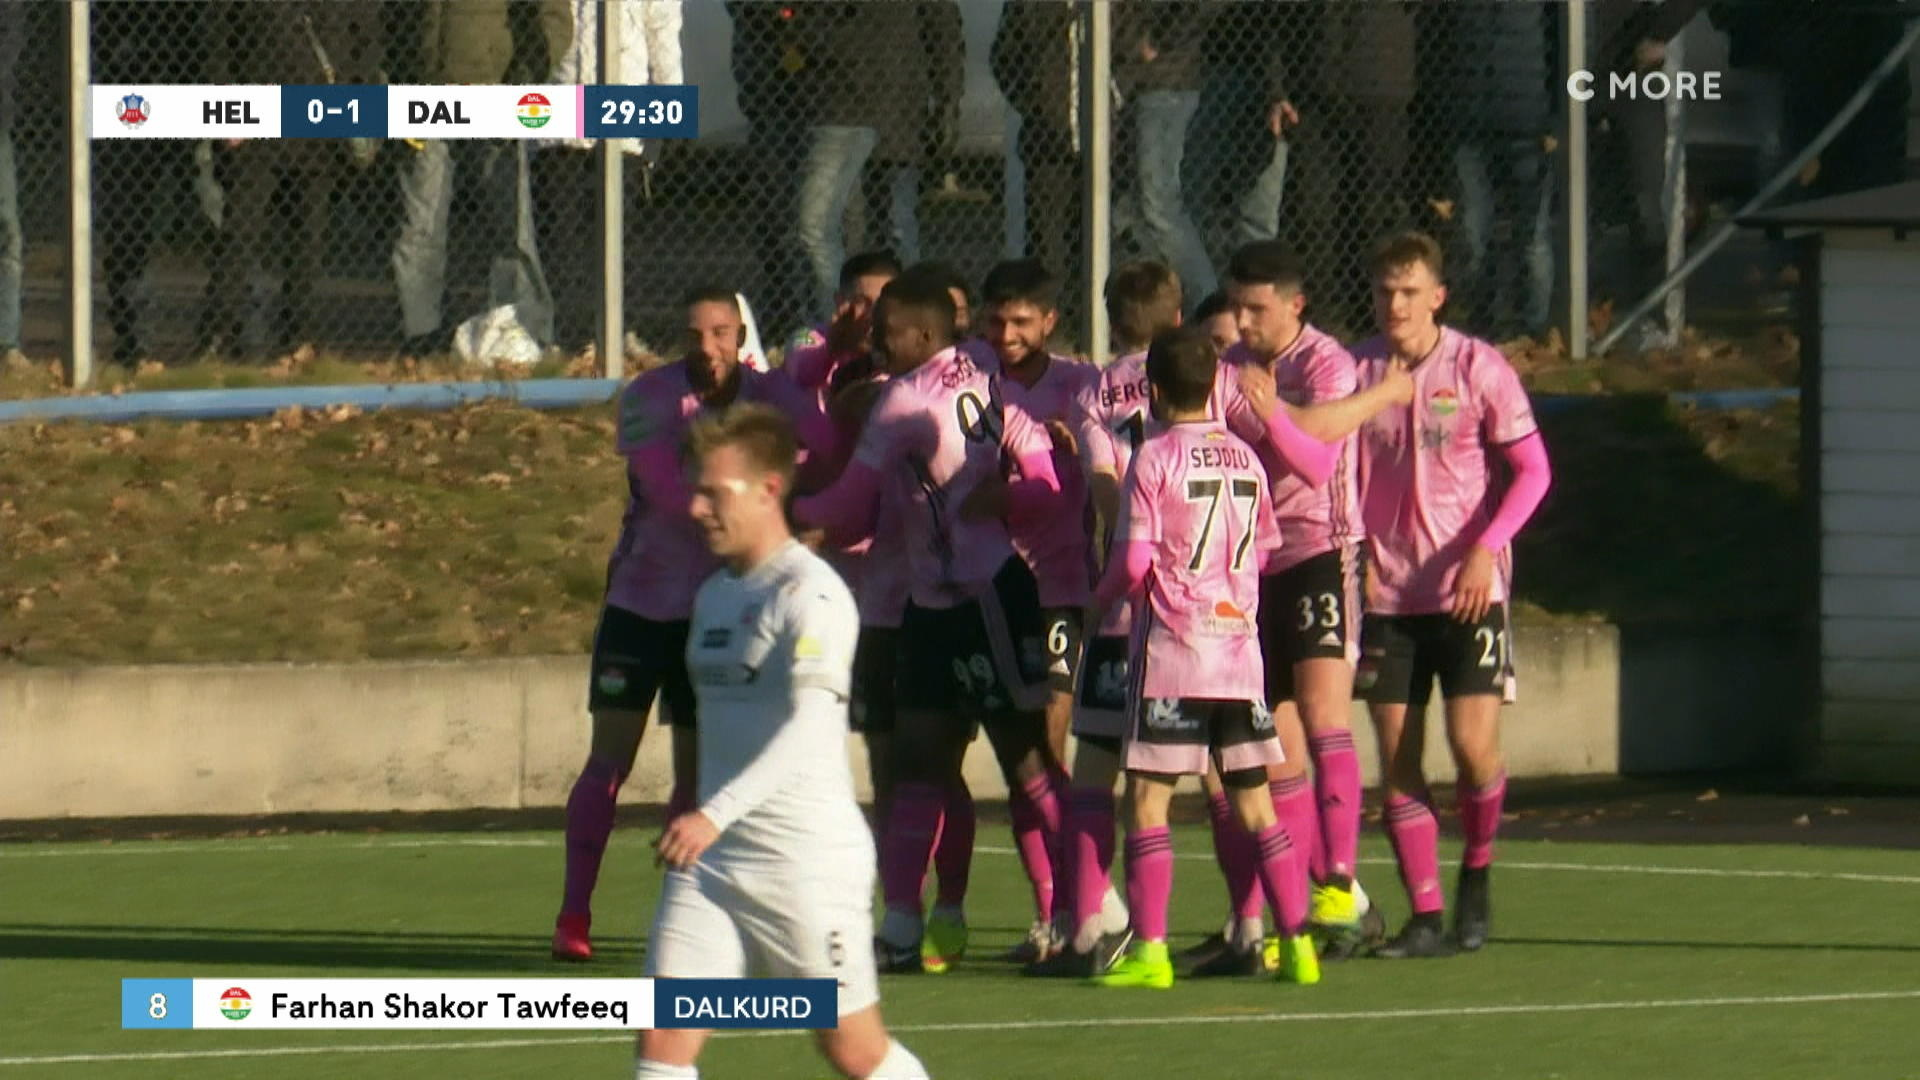 Dalkurd-yttern nickar in 1-0 mot Helsingborg